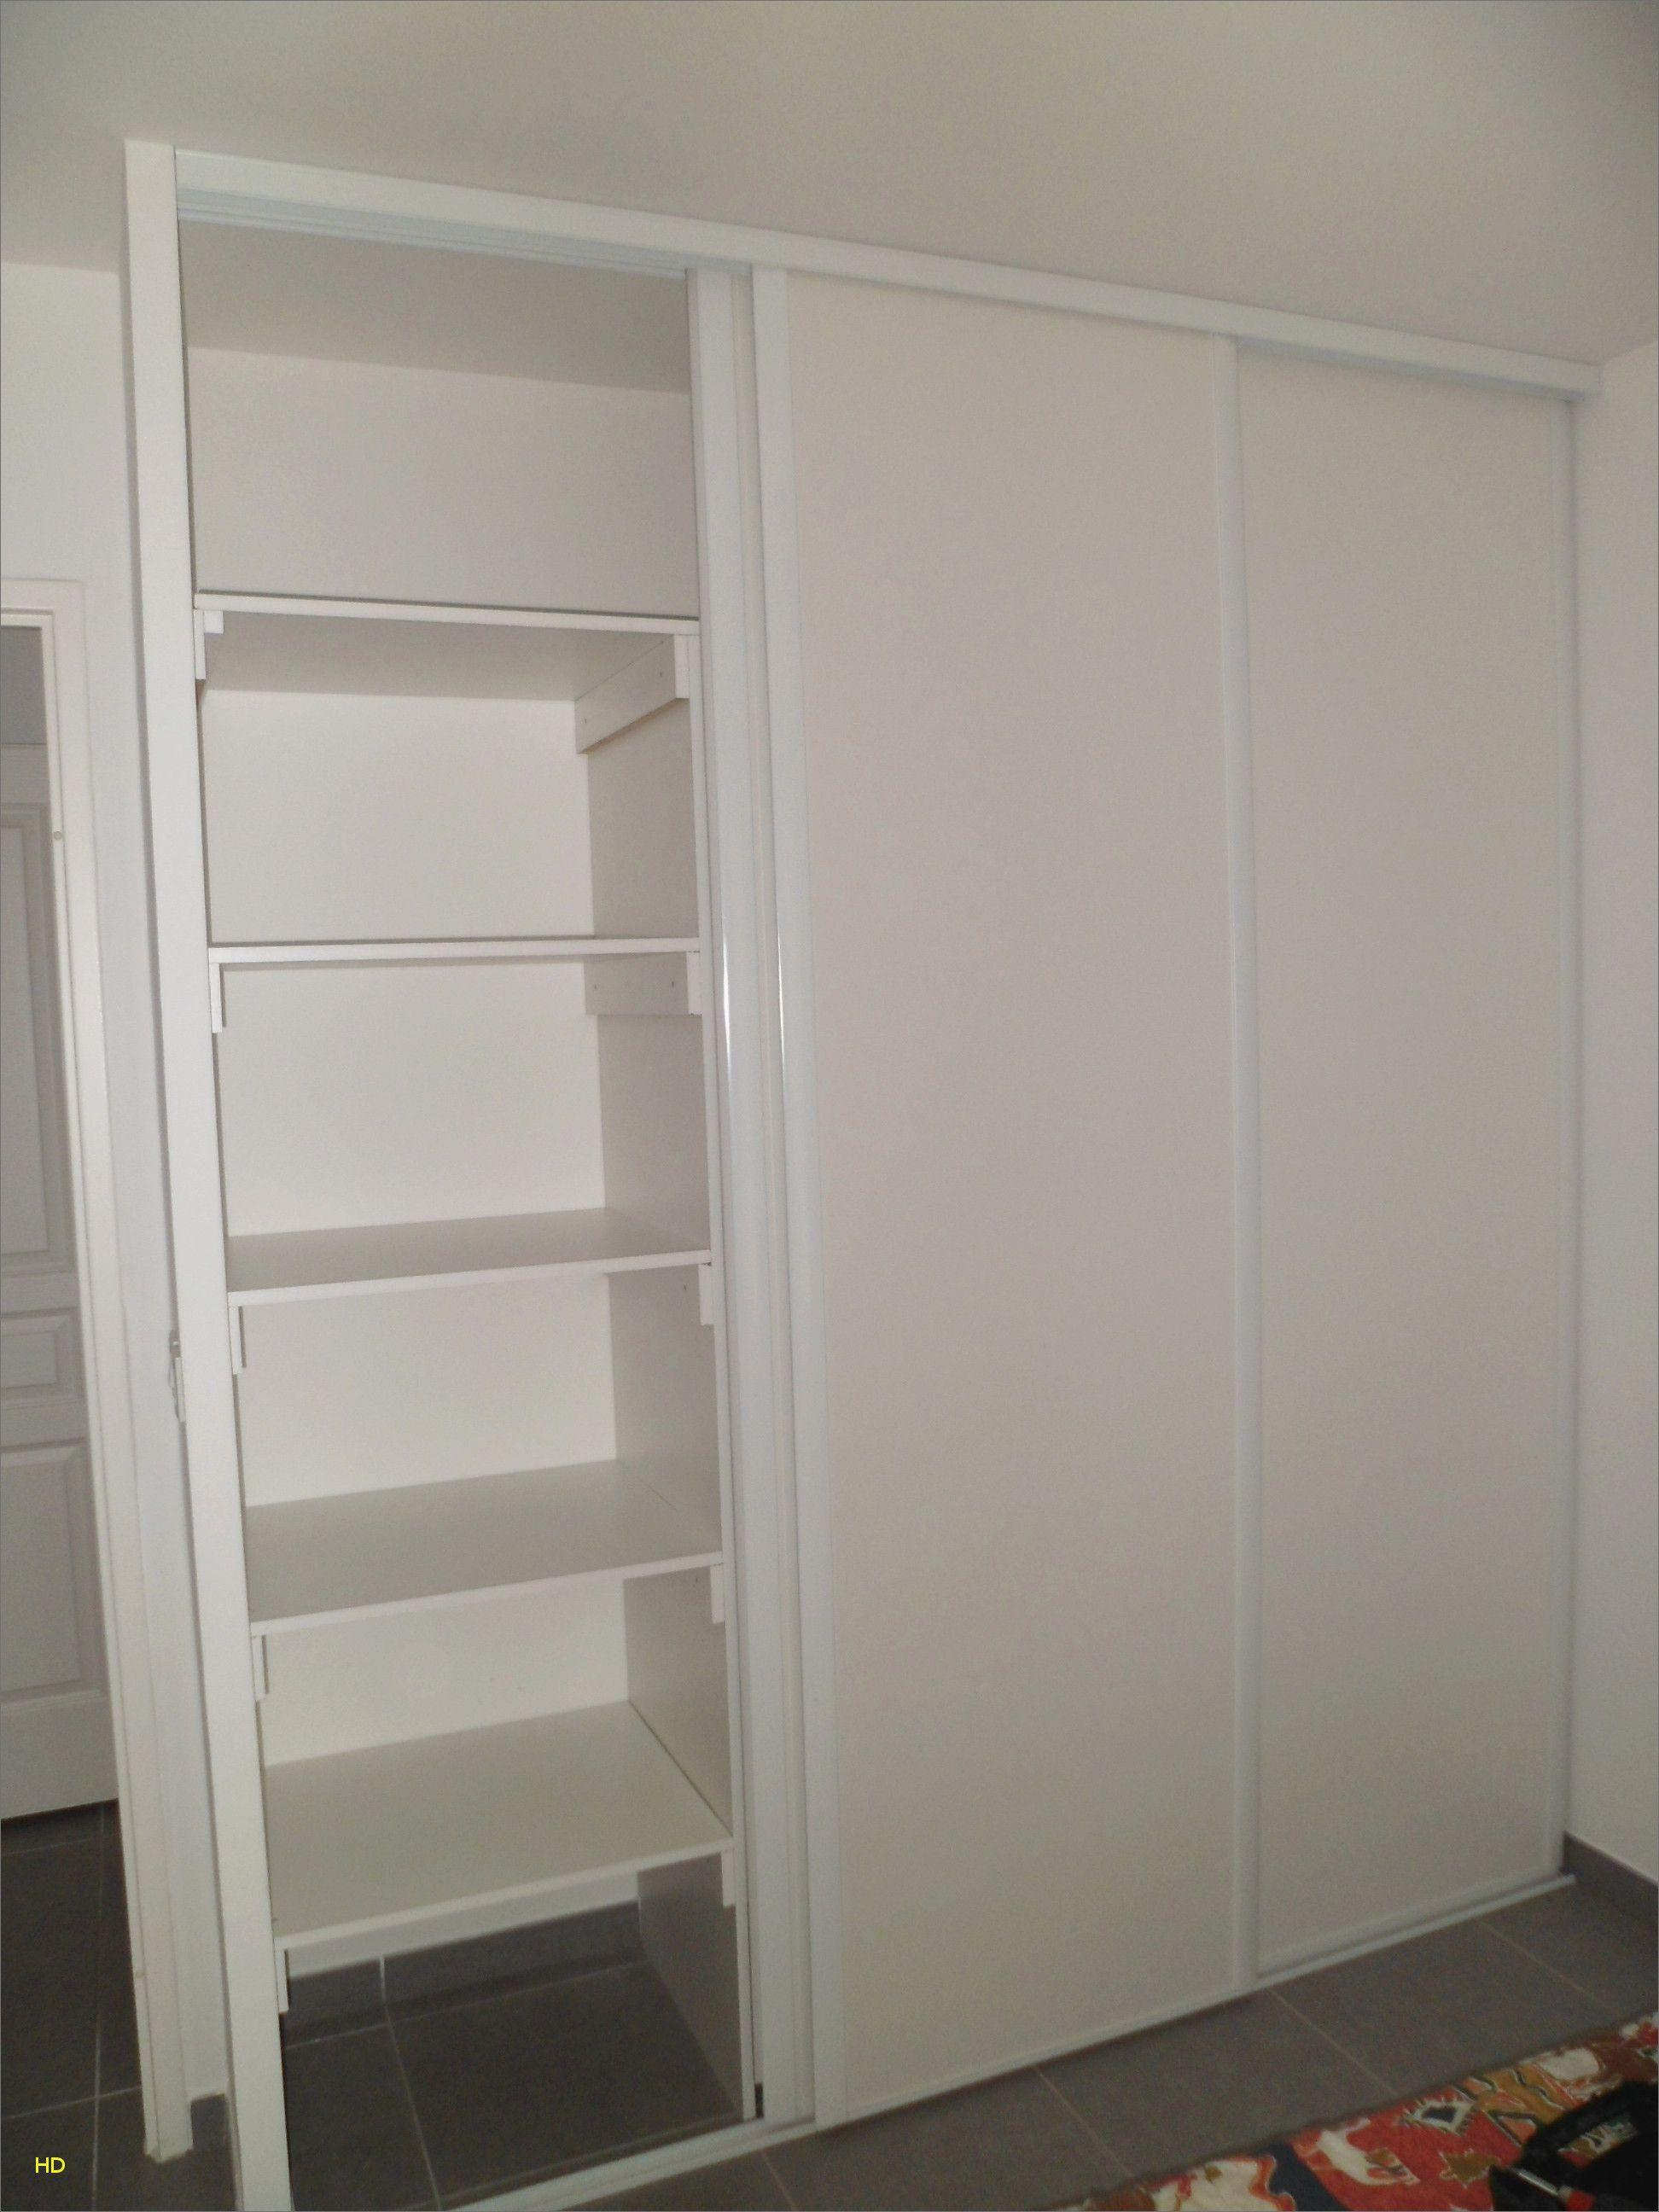 Elegant Porte Sur Mesure Castorama Locker Storage Interior Design Bedroom Storage